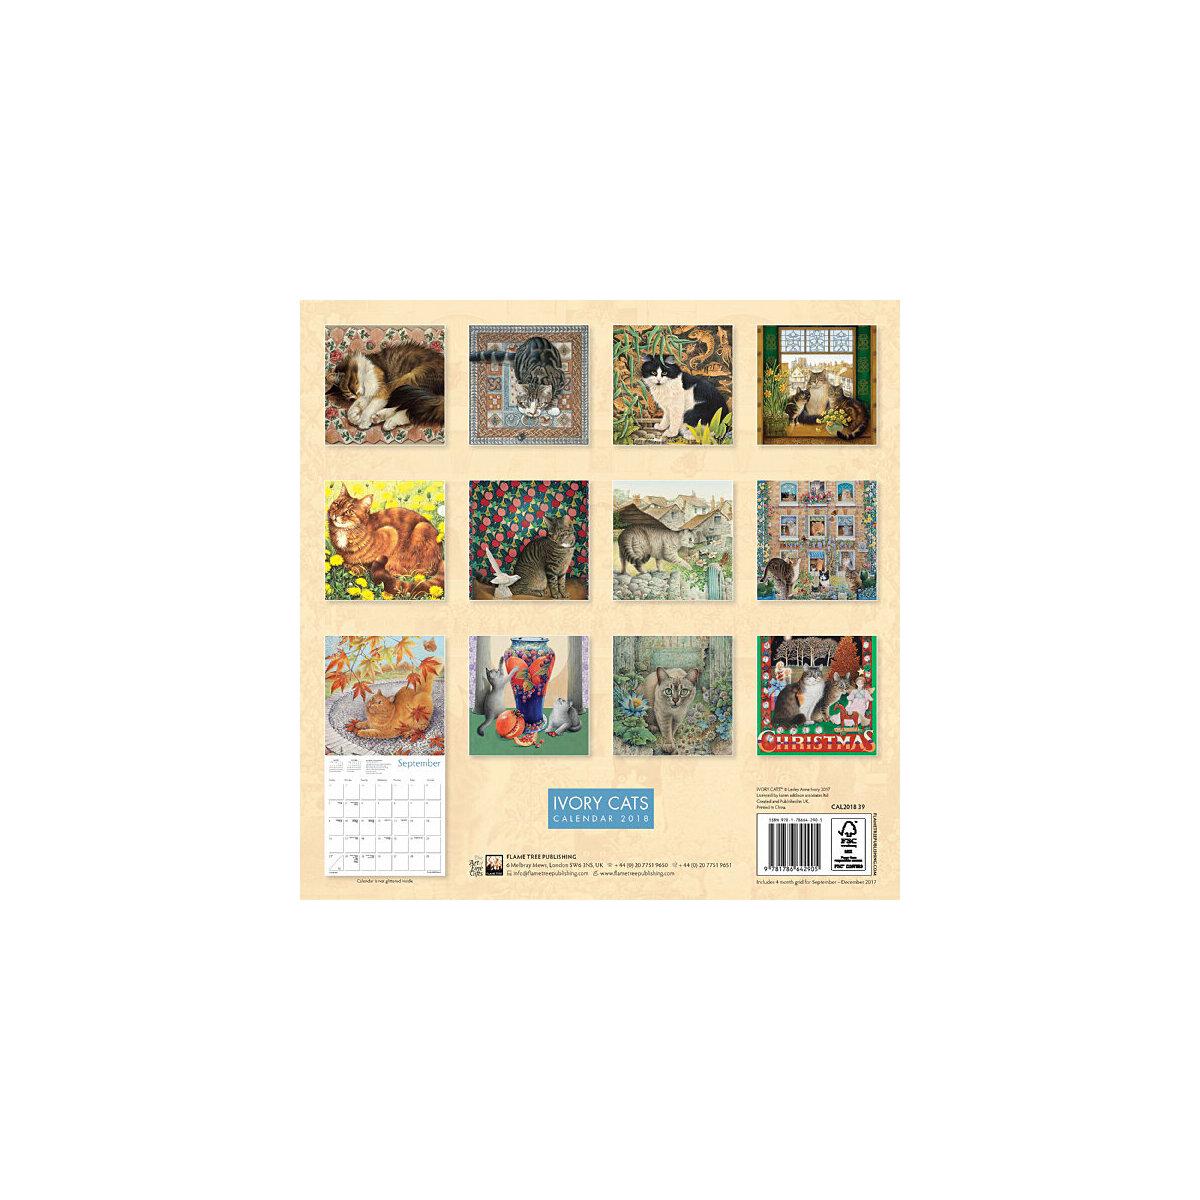 calendrier 2018 chats dans l\'art Ivory